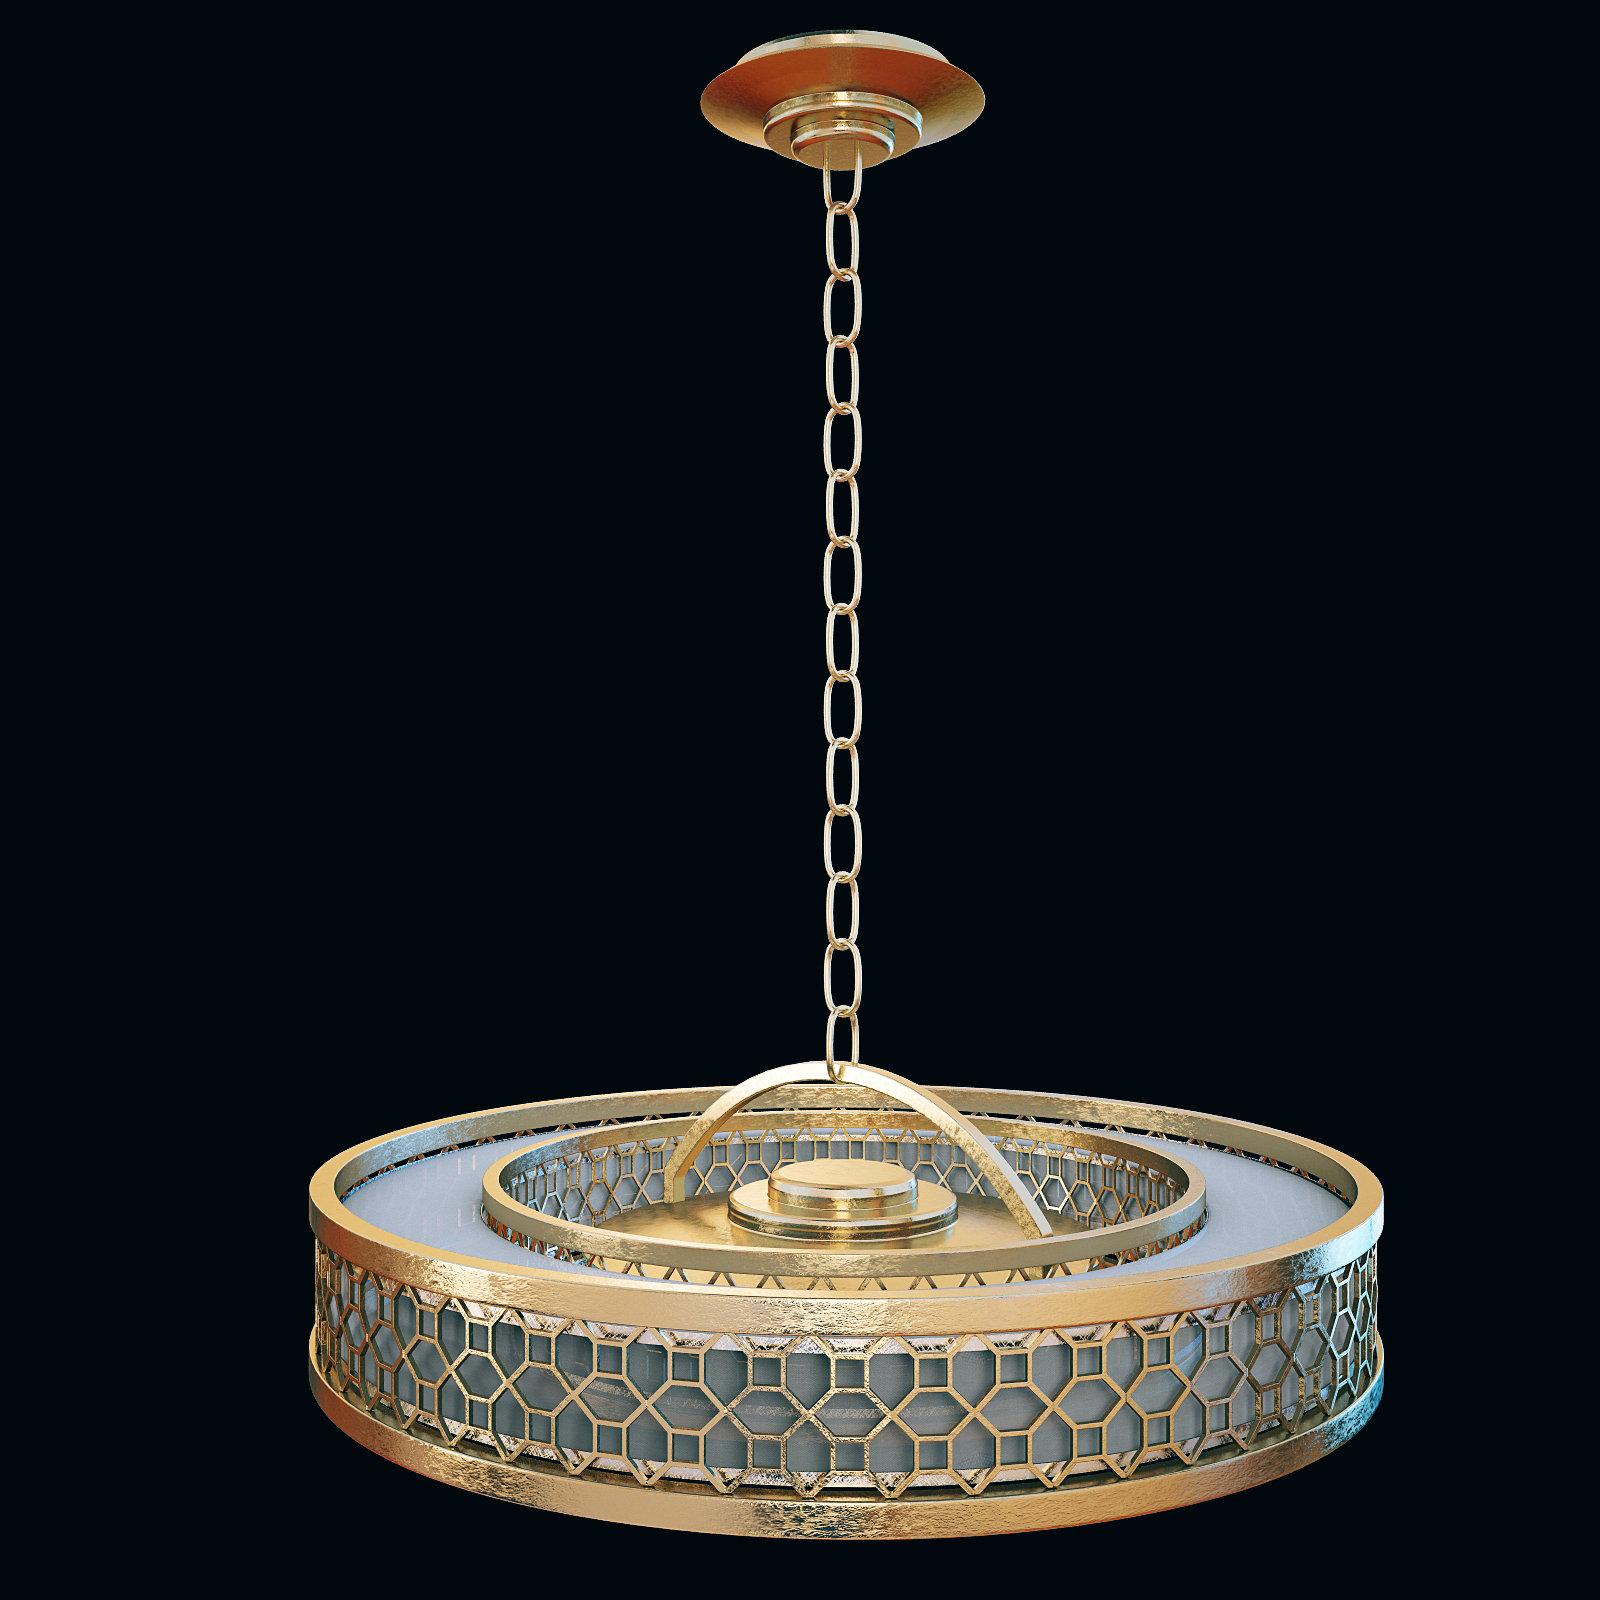 2014 - lustre 816640-2GU FINE ART LAMPS(CGTRADER)